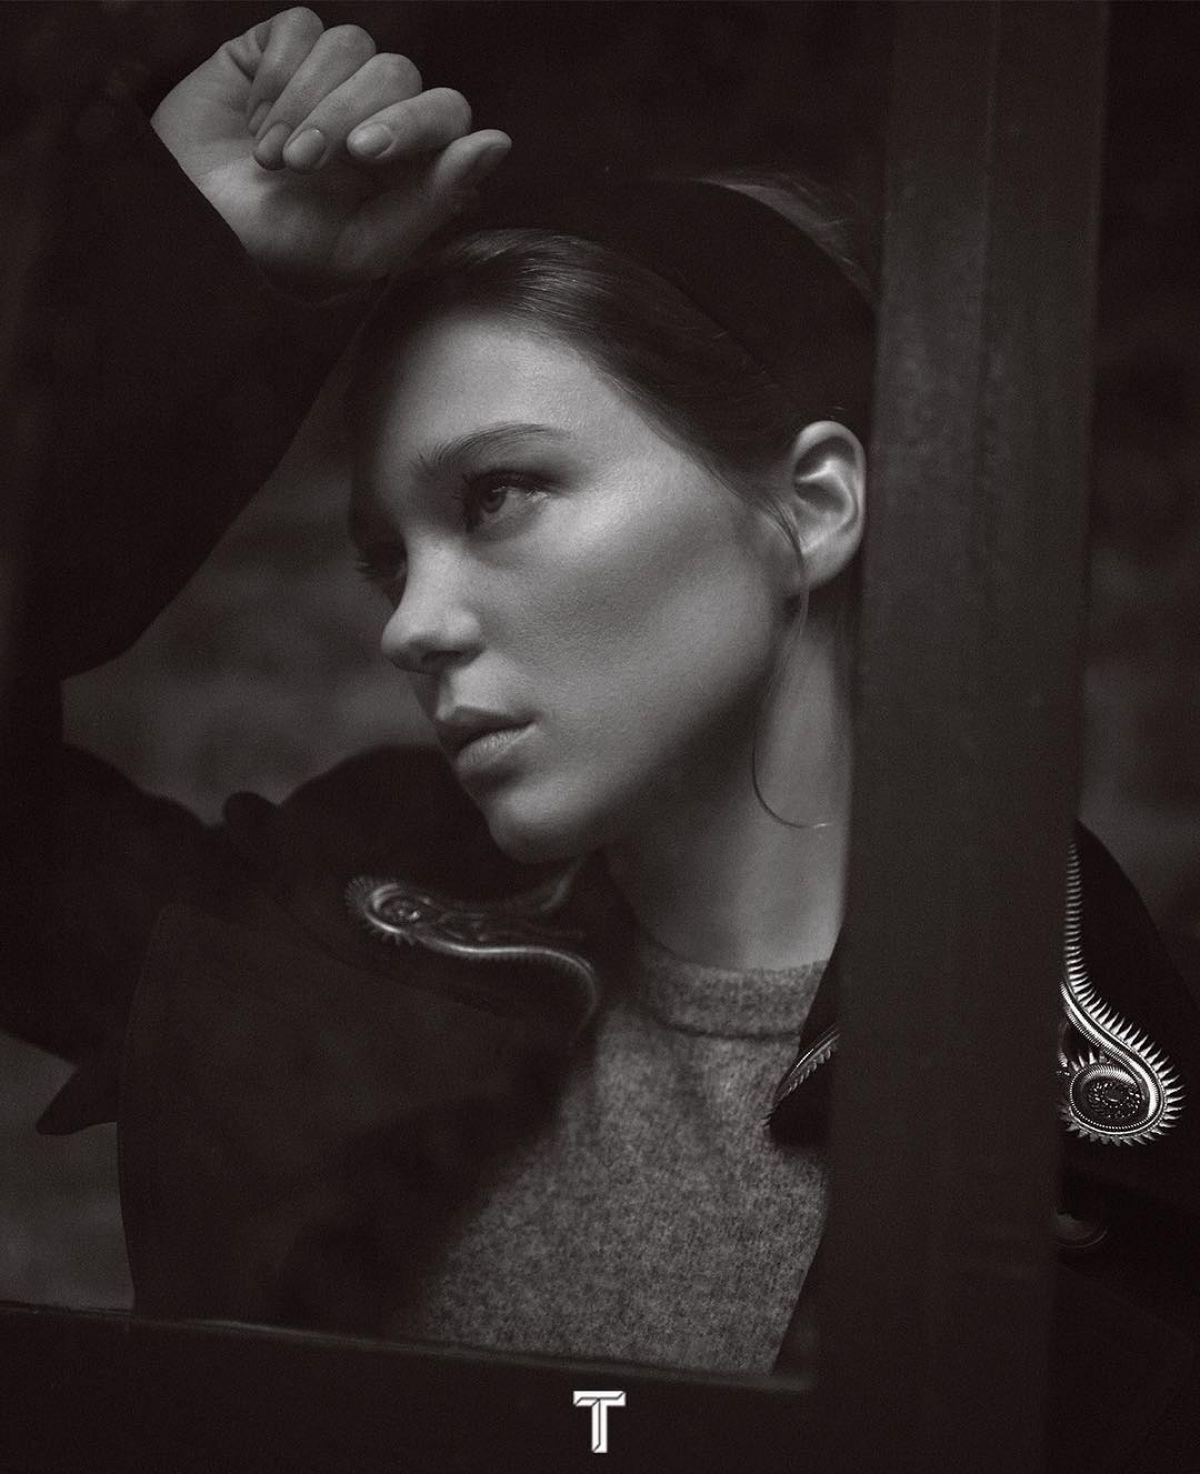 Lea Seydoux - T Magazine China Photoshoot - 2018